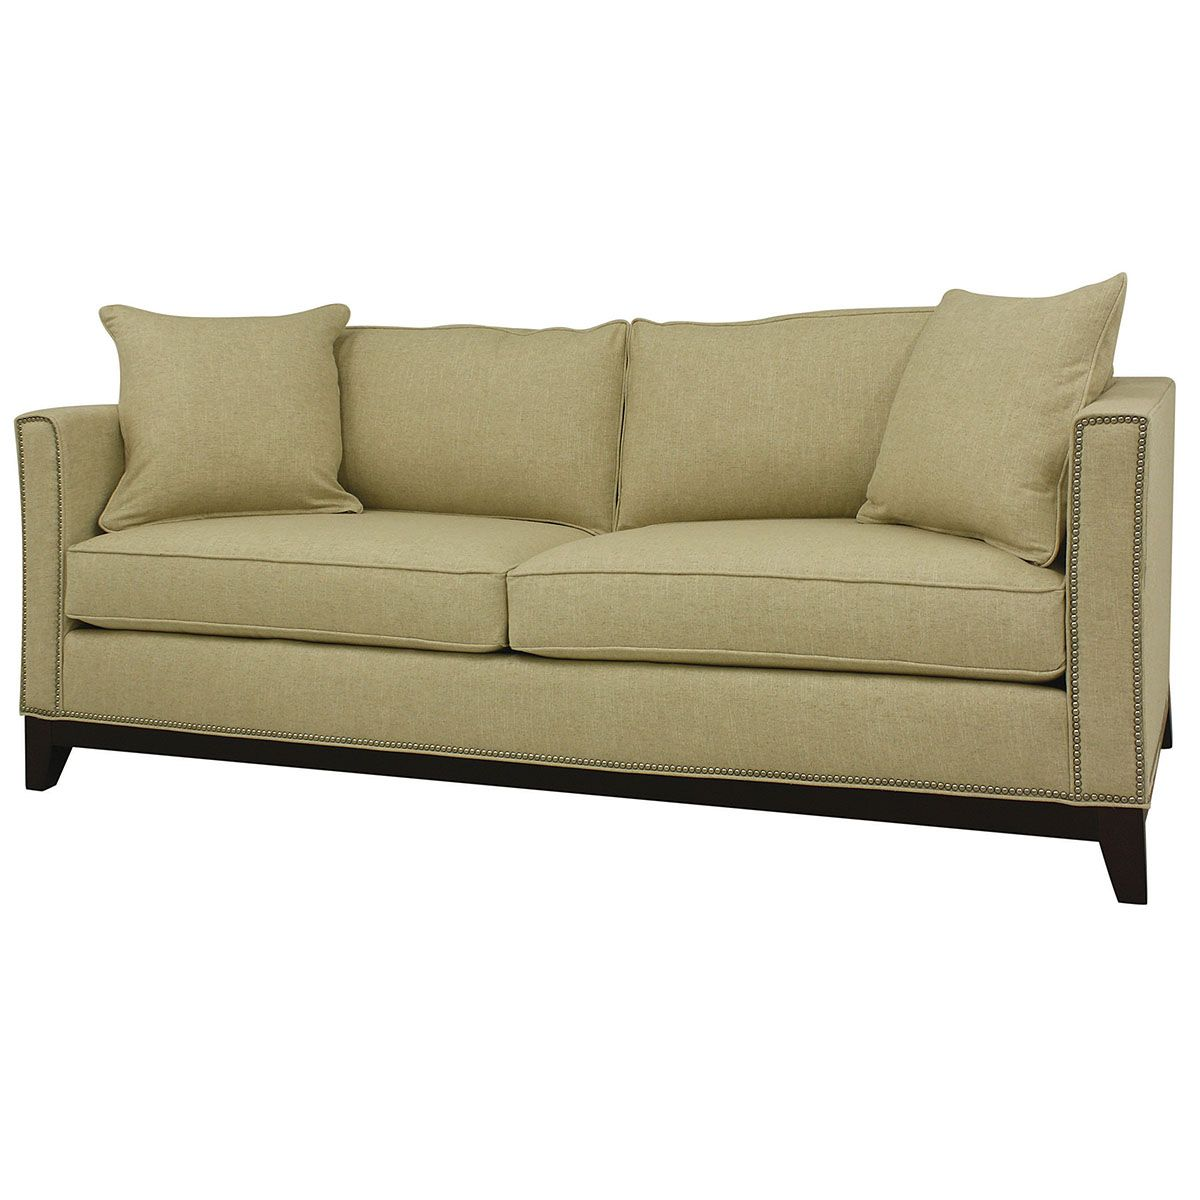 sofas in atlanta corner sofa peterborough 88 70 cotton 30 linen w x 38 d 31 h finish color s ranger natural gibson jute